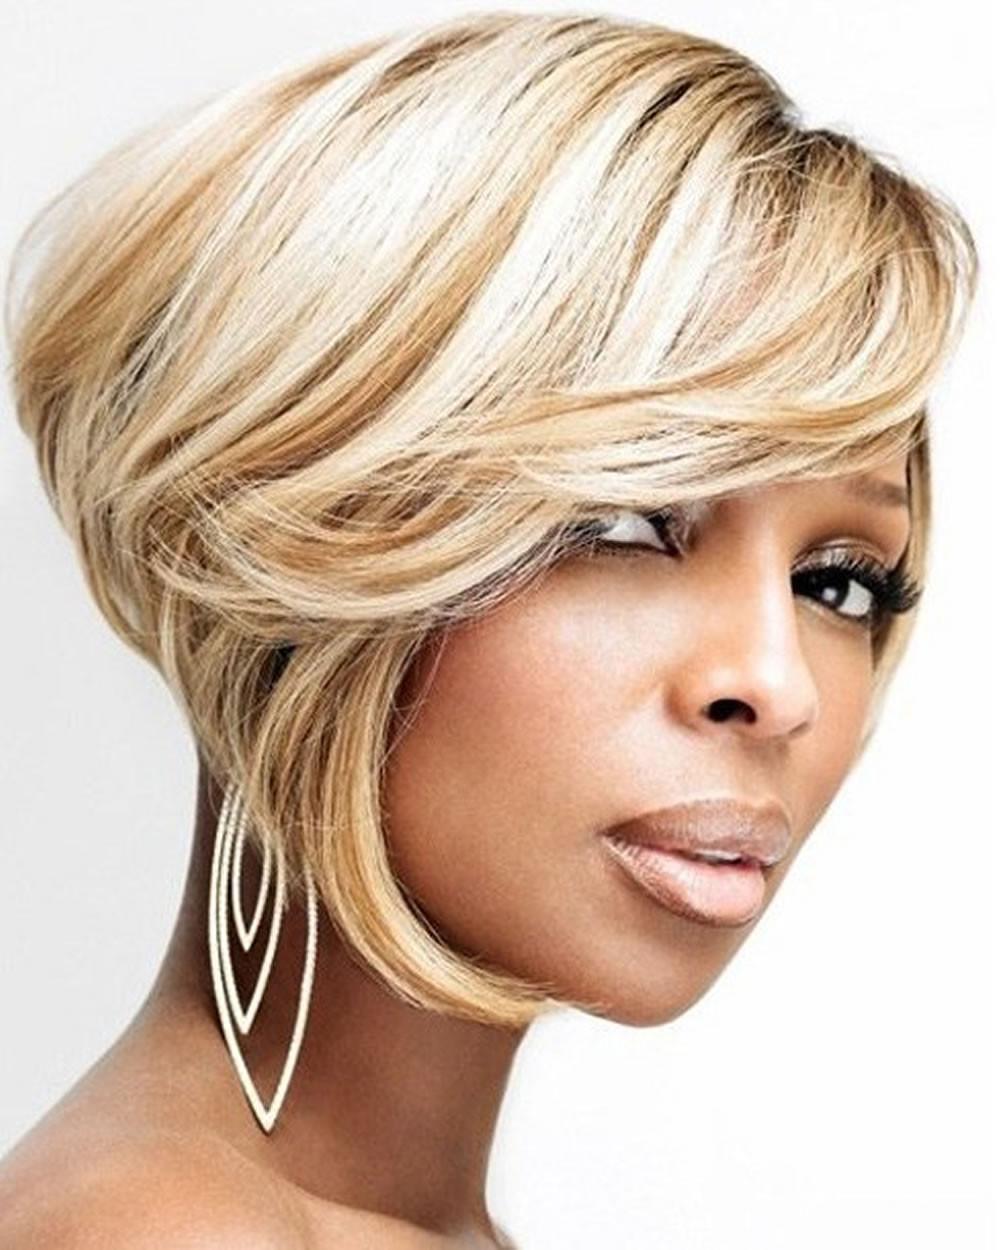 Black Short Bob Hairstyles 2019  Short Bob Hair for African American Women 2018 2019 – Page